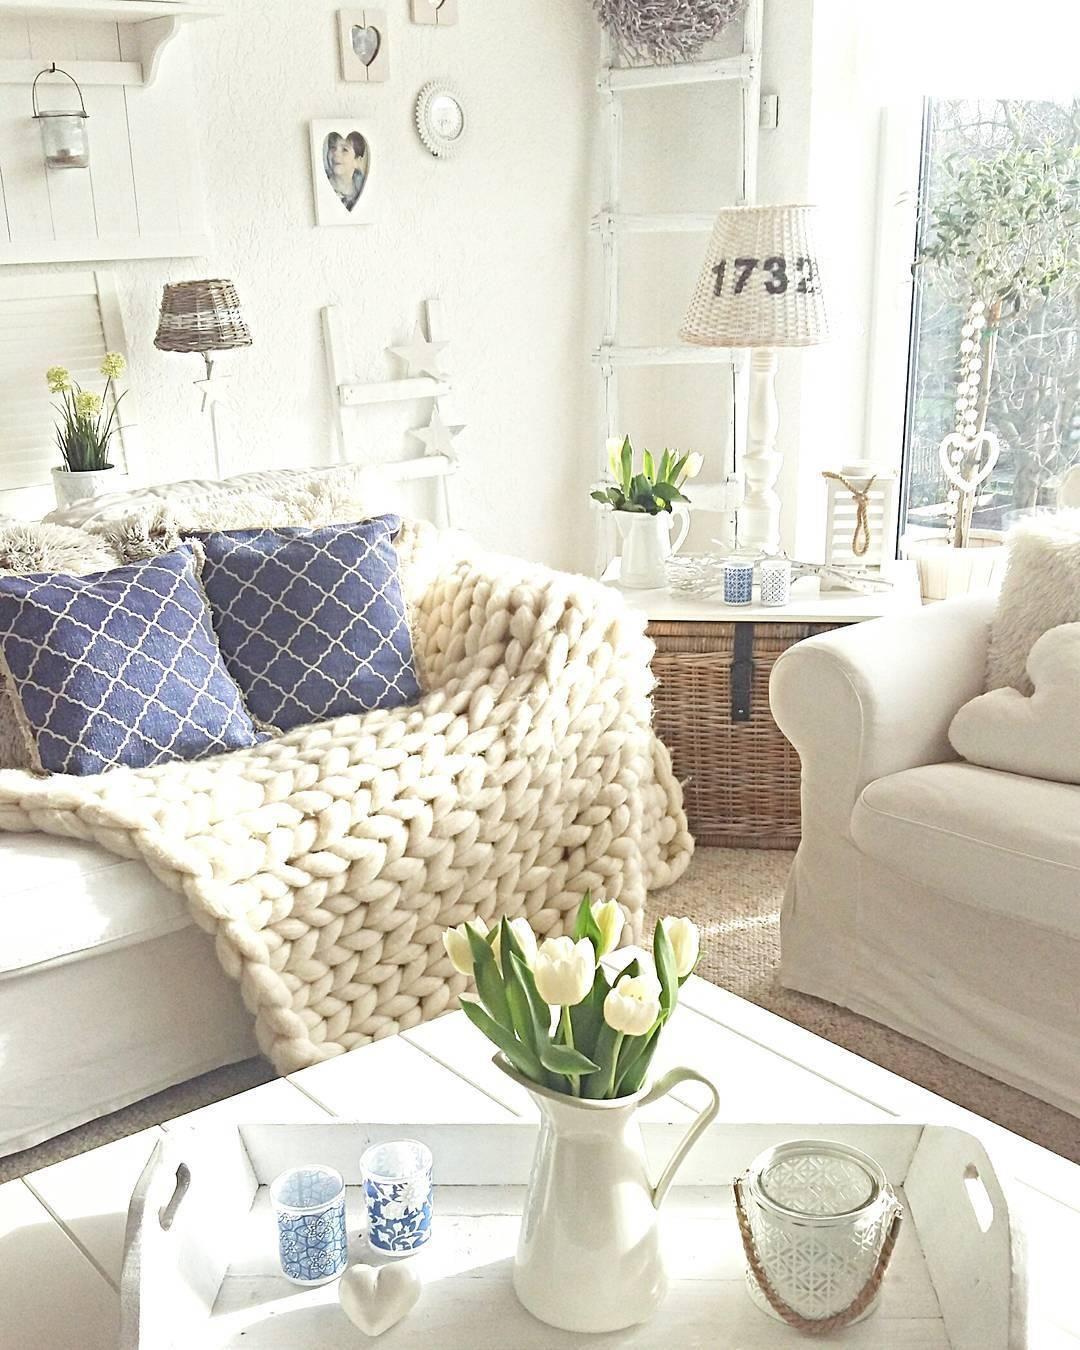 Handgefertigtes Woll-Plaid Super Chunky   Kissen sofa, Wohnzimmer ...